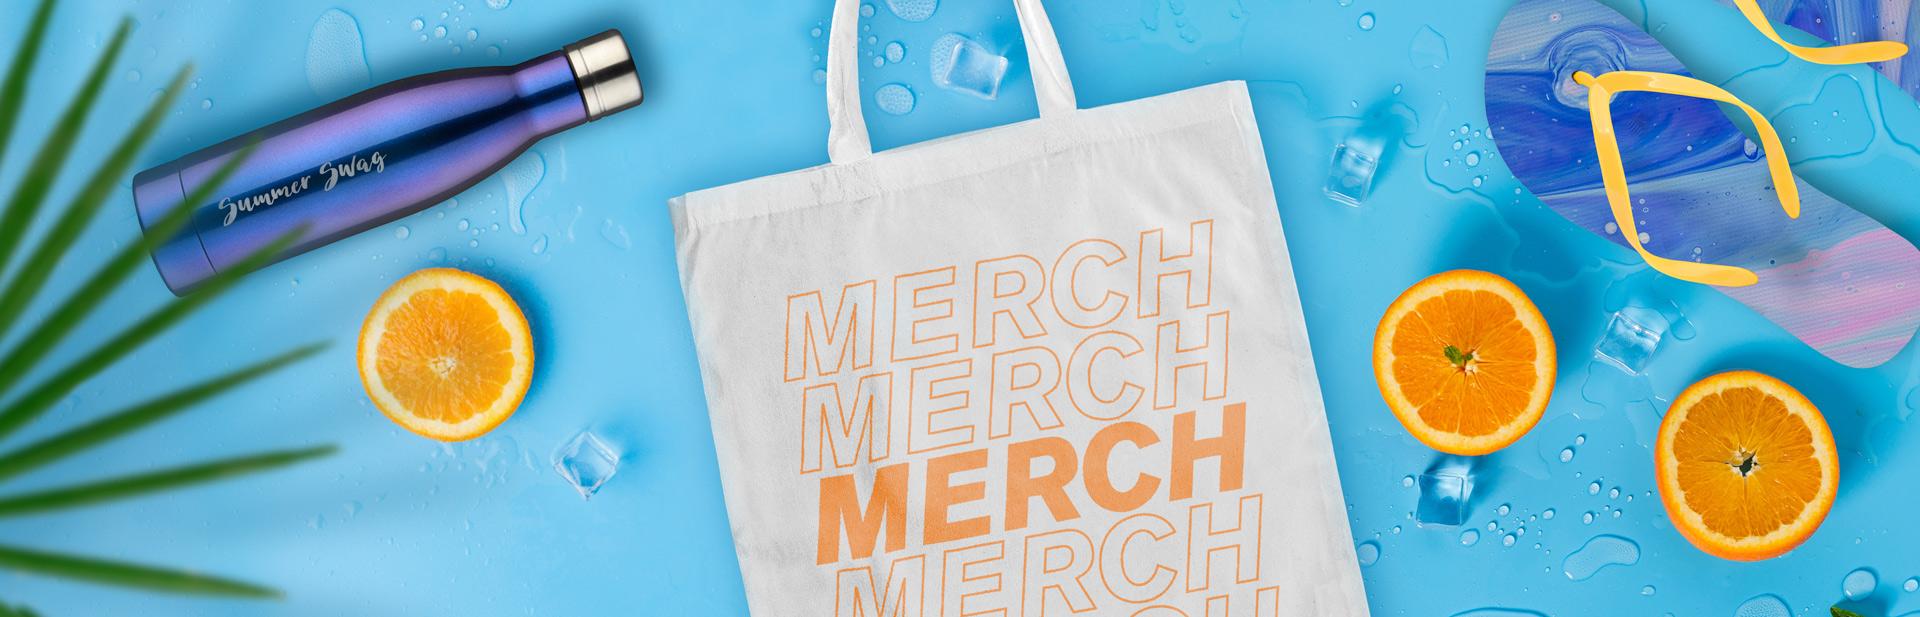 summer-promotional-merchandise-ideas